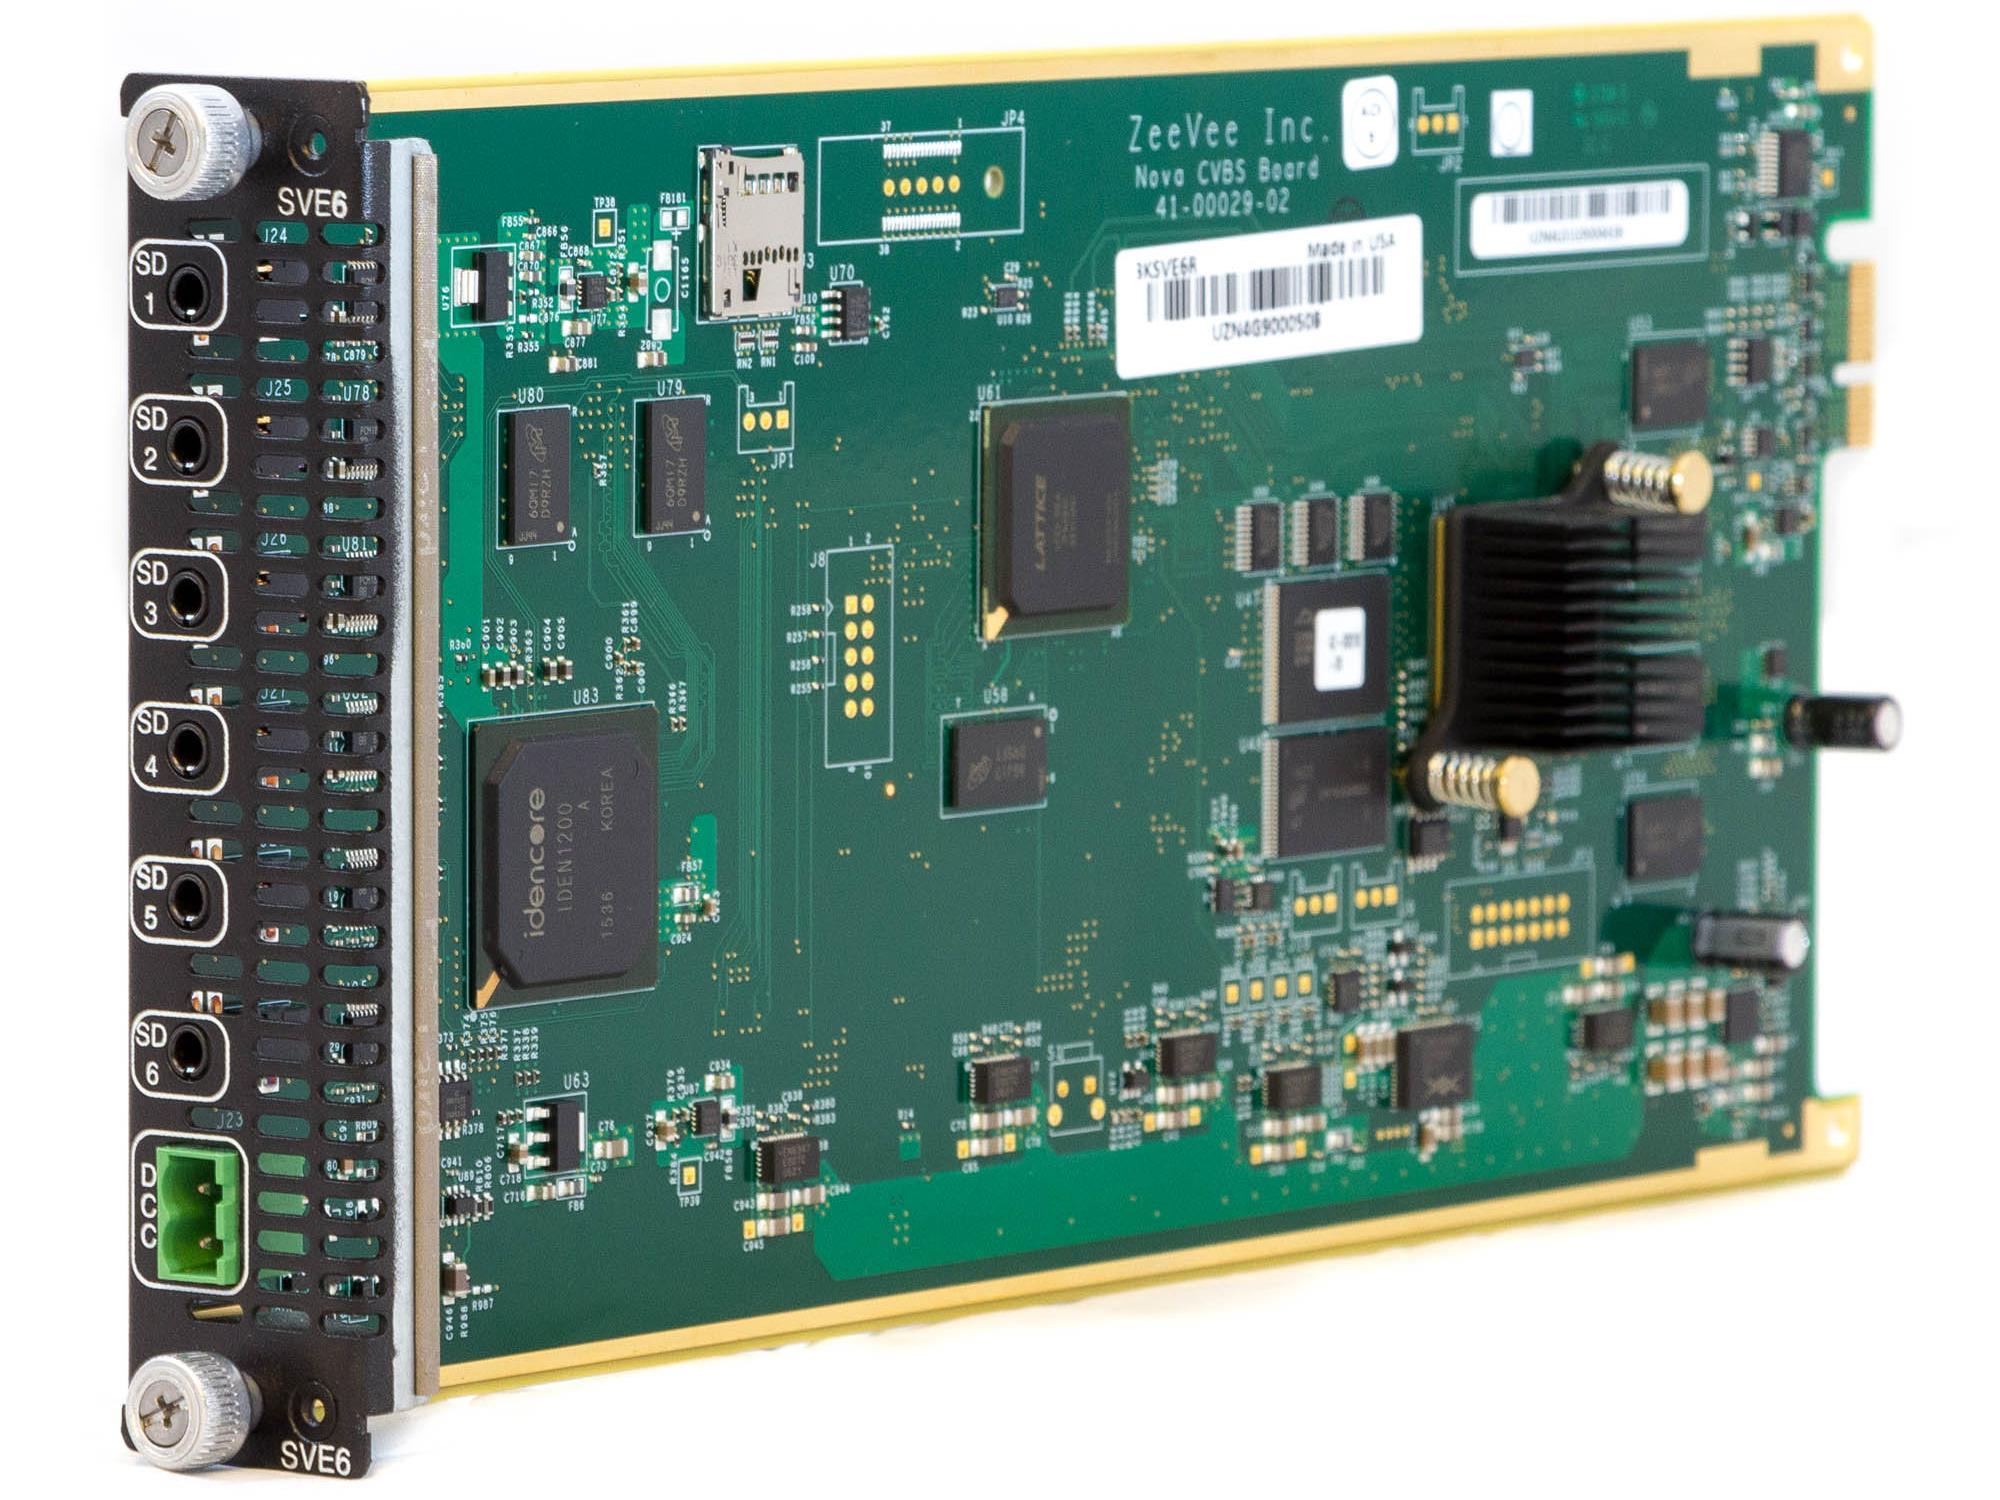 ZeeVee 3KSVE6R Composite Media Module Blade SD video encoder/modulator for HDbridge3000